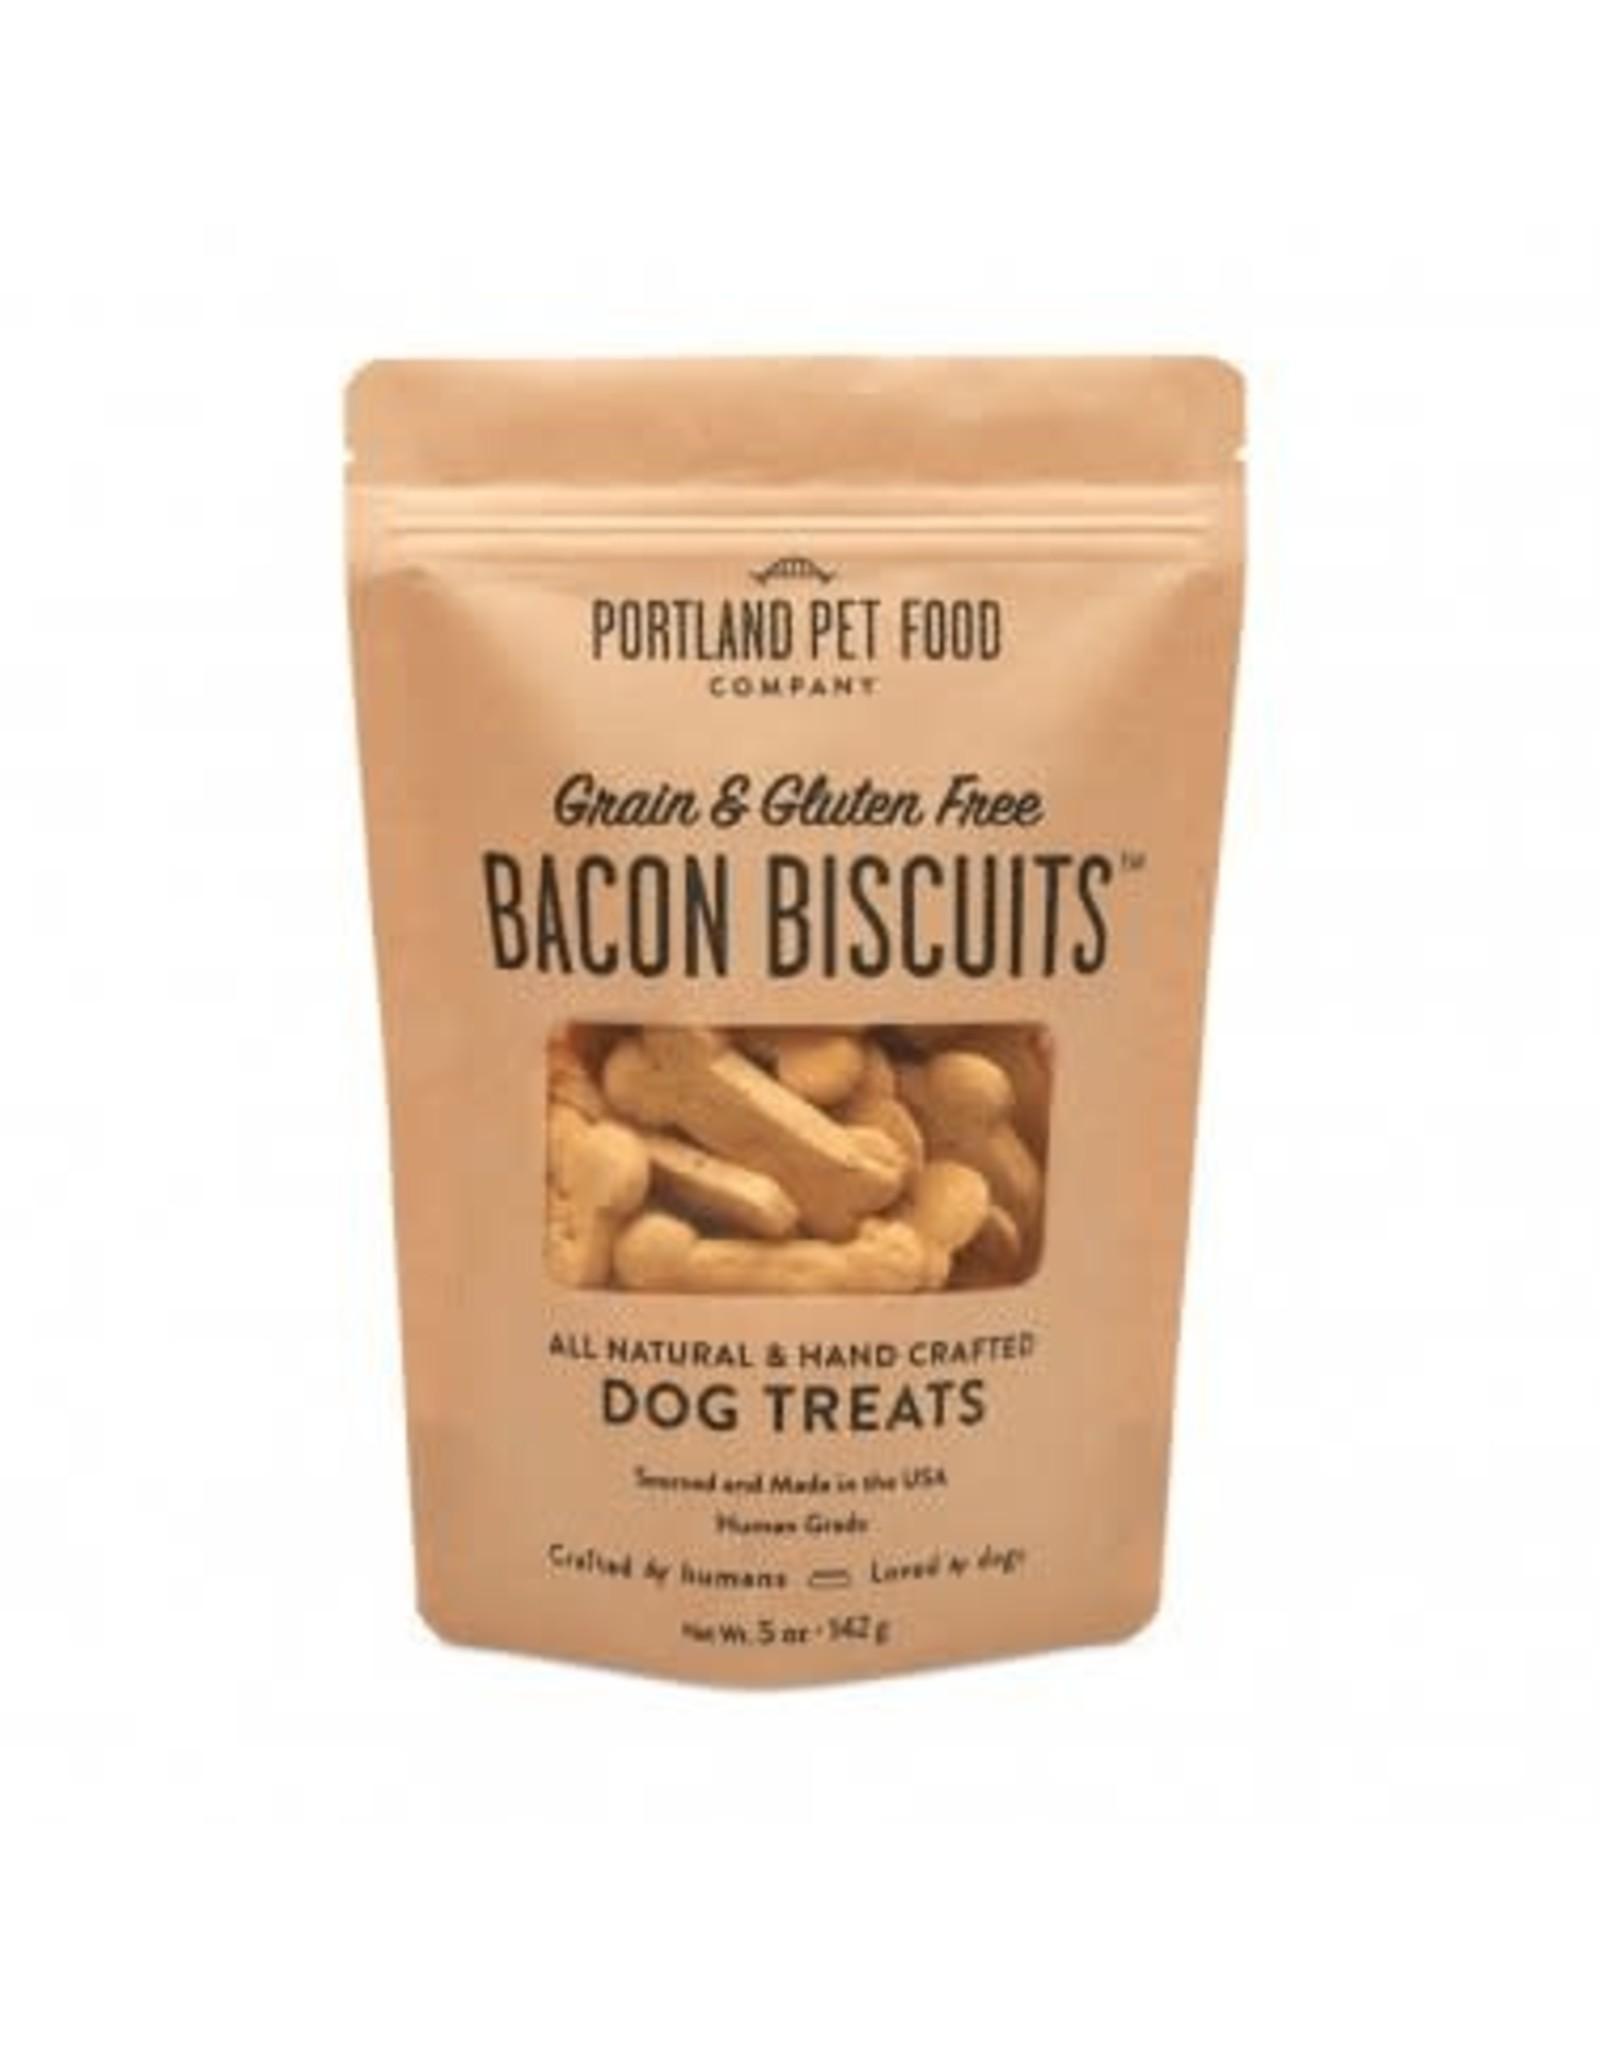 Portland Pet Food Portland Pet Food Grain-Free Bacon Biscuits Dog Treats 5oz